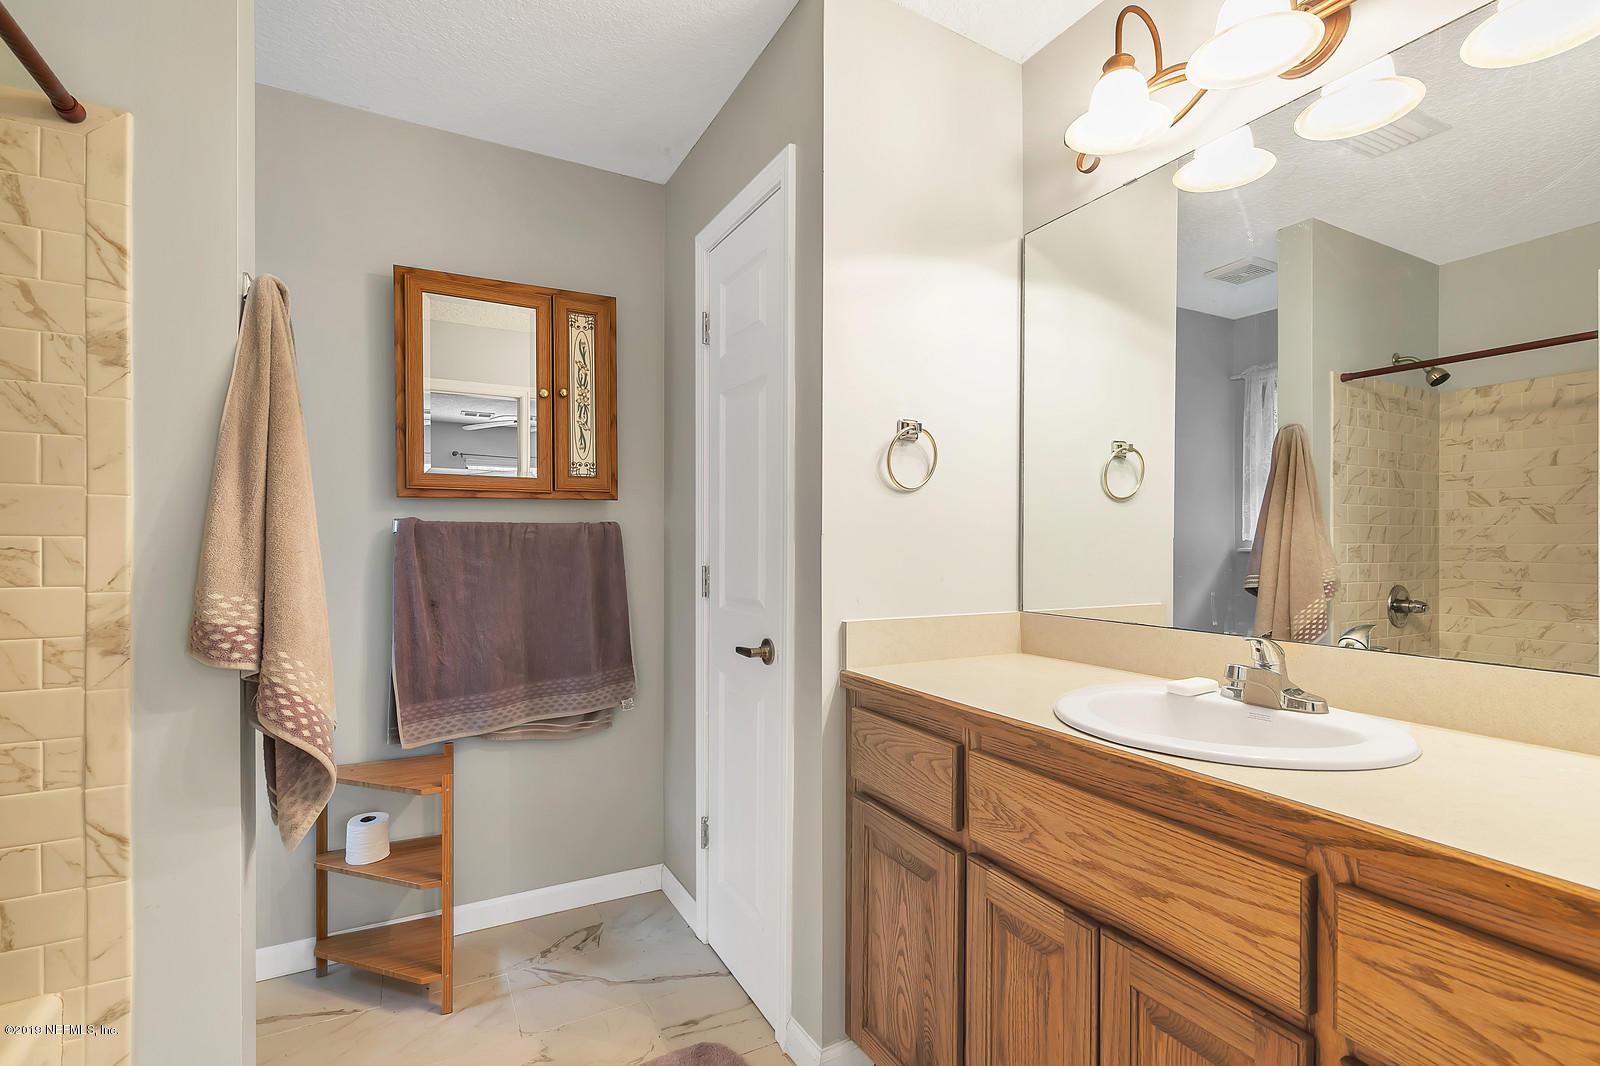 4856 CHESTNUT FOX, MIDDLEBURG, FLORIDA 32068, 3 Bedrooms Bedrooms, ,2 BathroomsBathrooms,For sale,CHESTNUT FOX,1022606